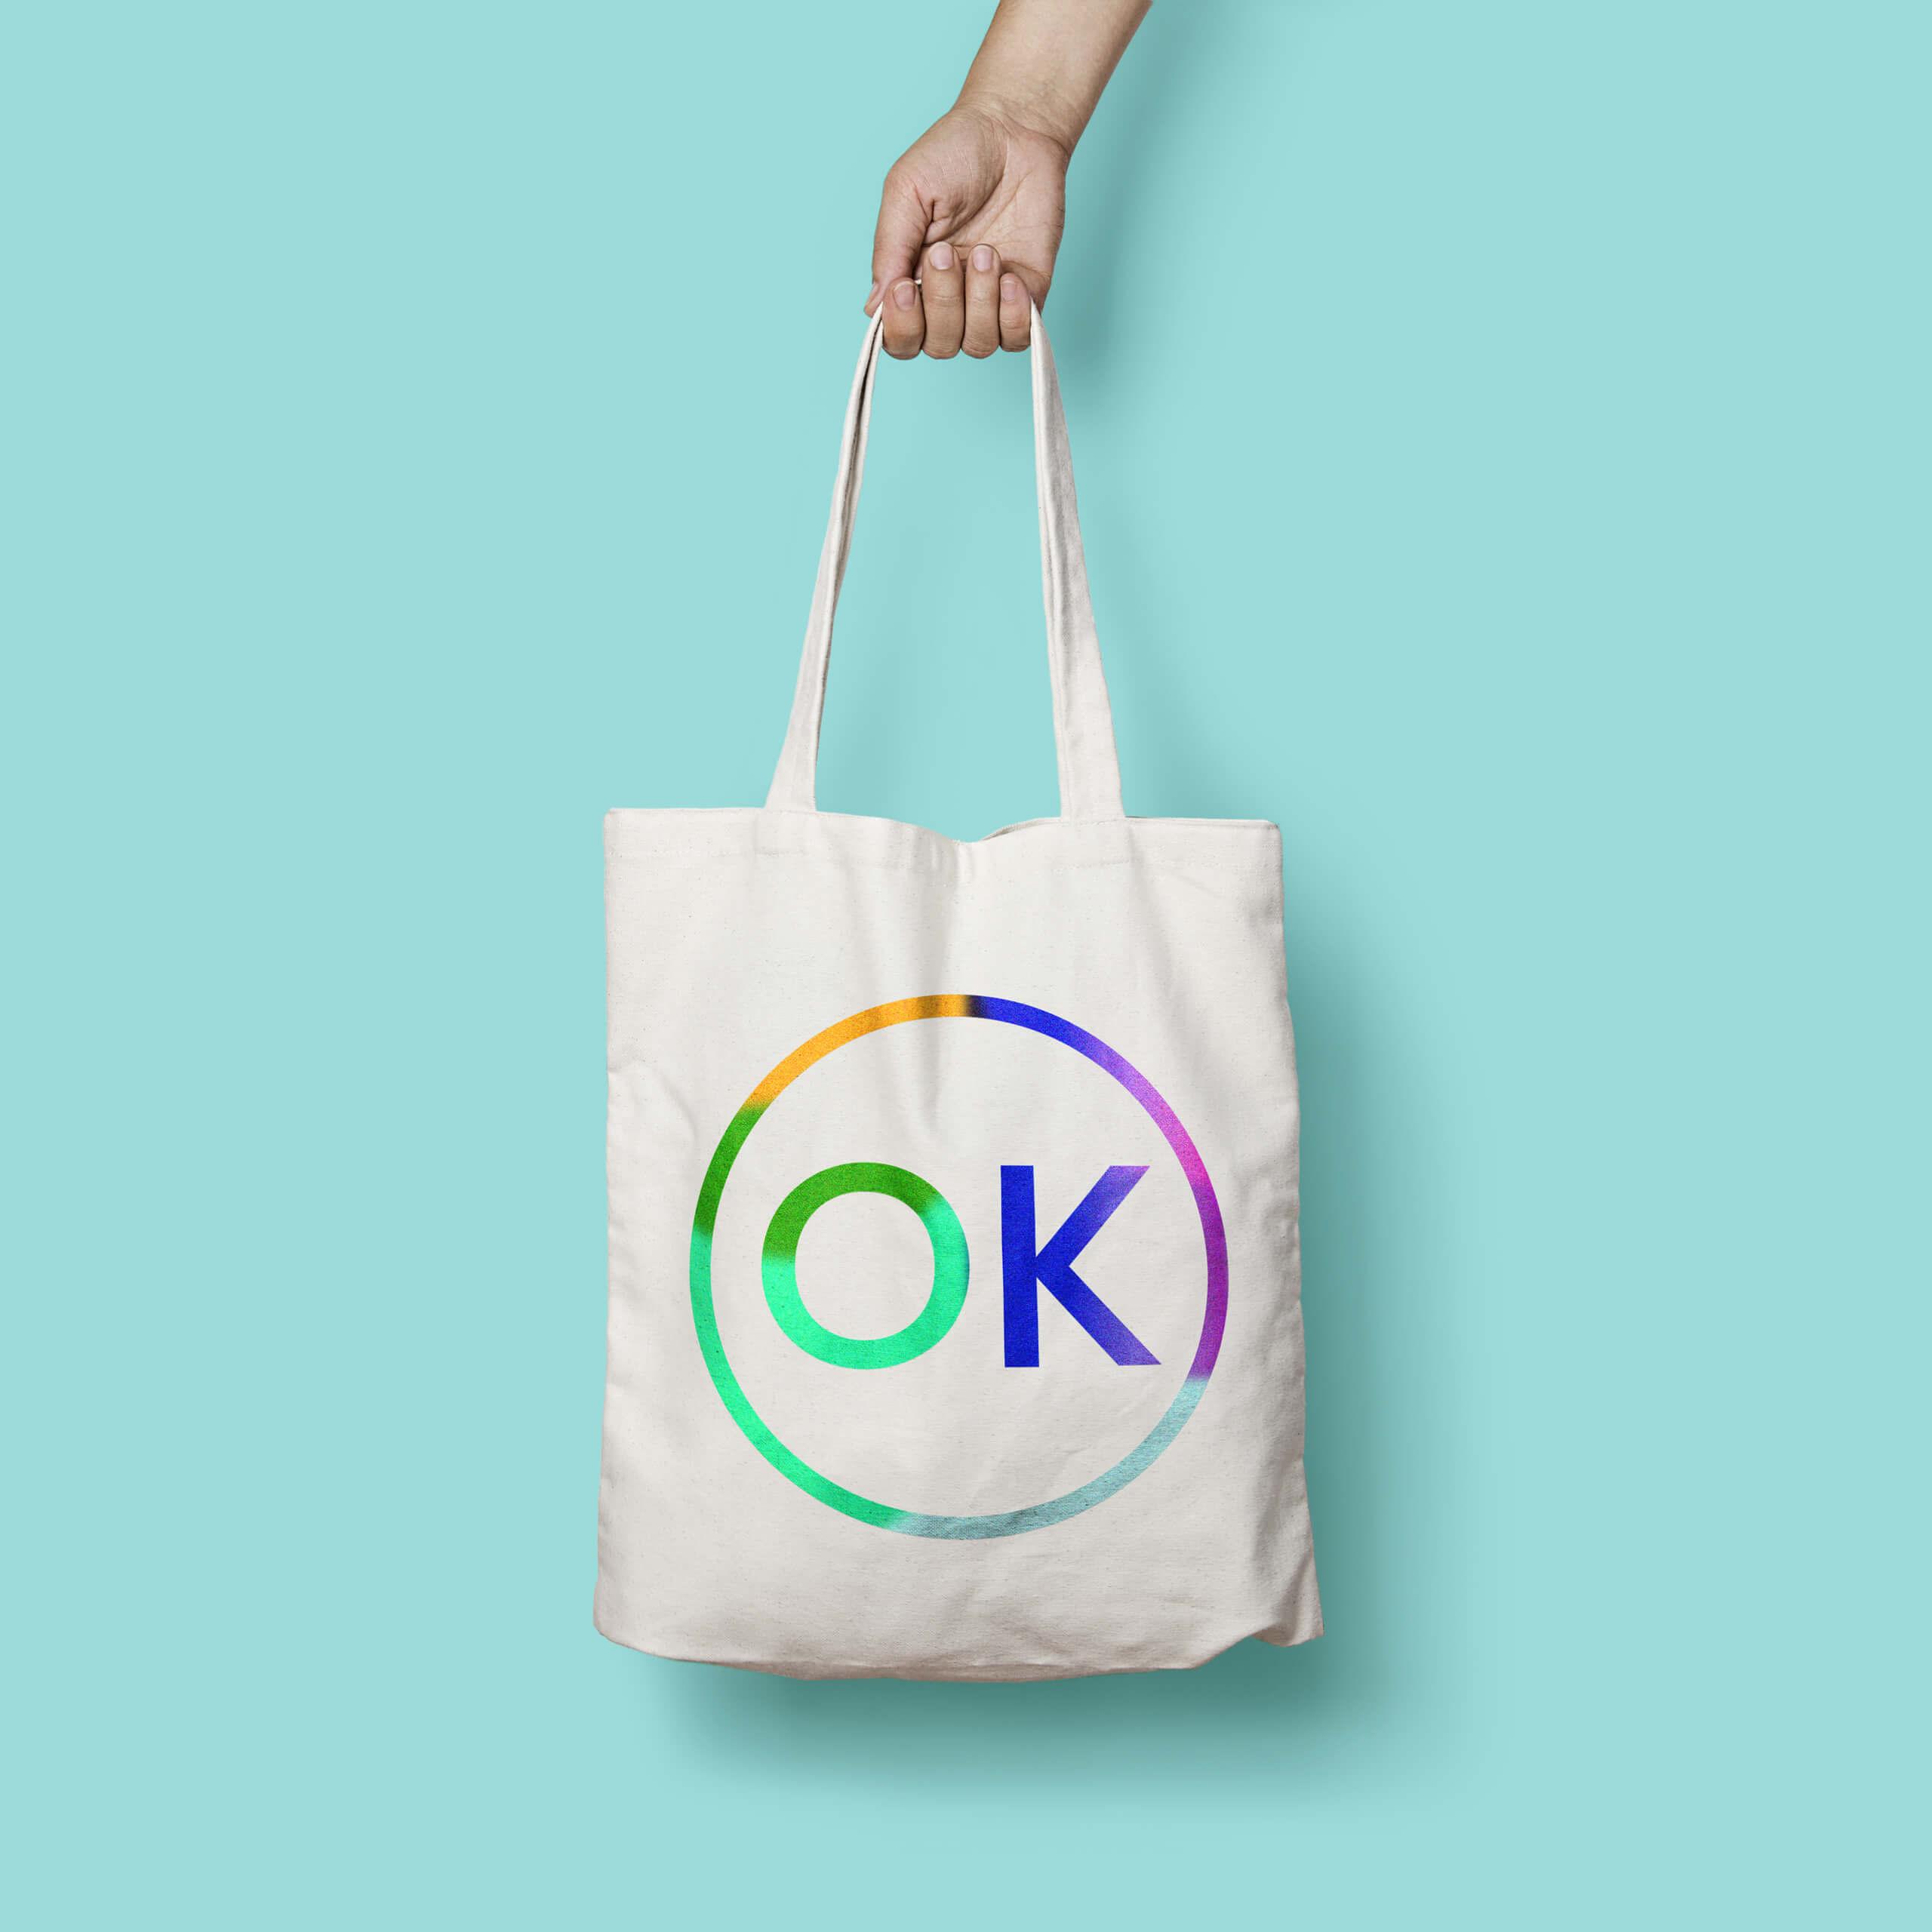 OK Stamp Press Tote Bag Design